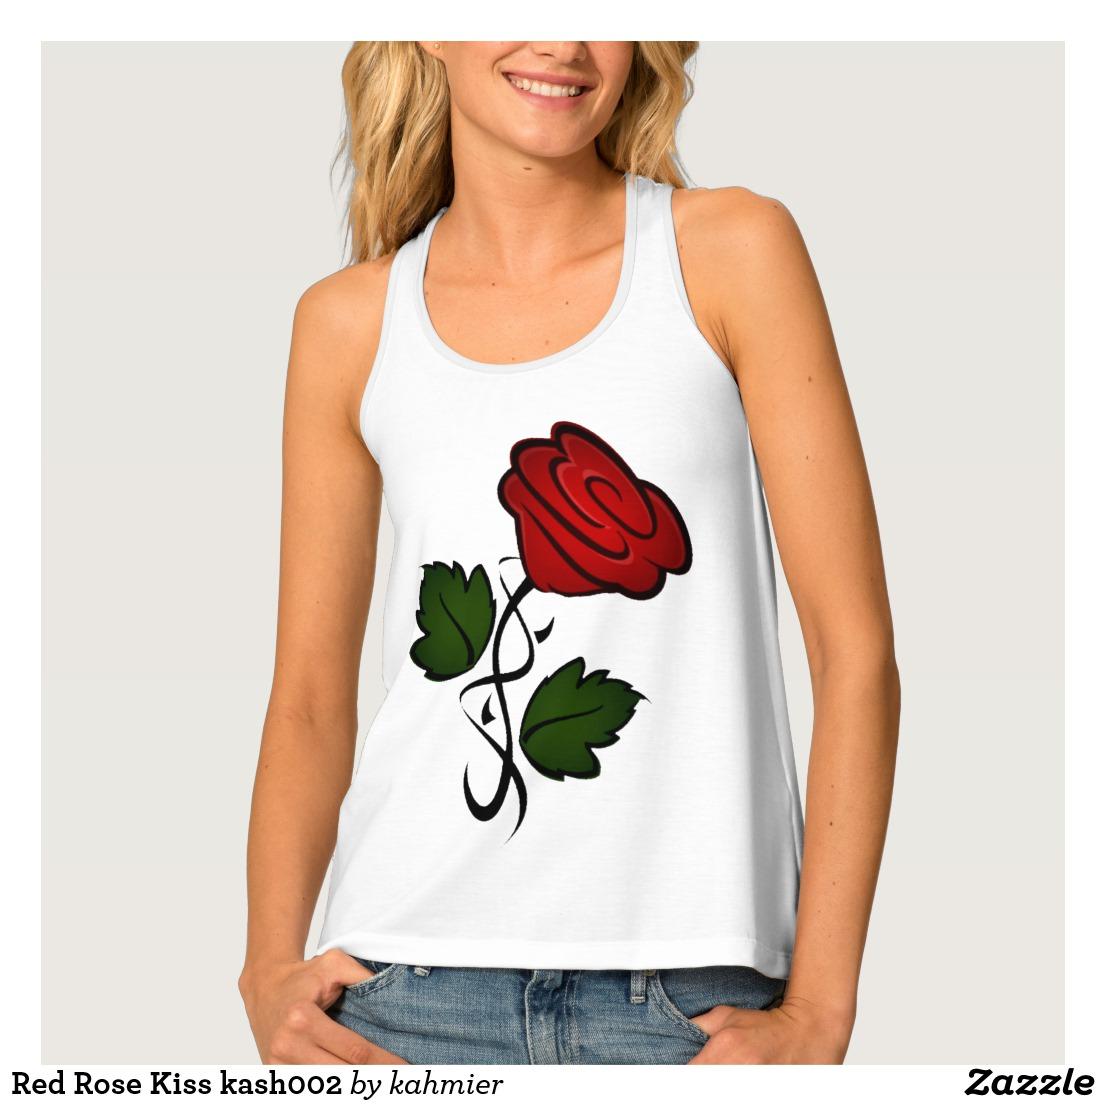 Red Rose Kiss kash002 Tank Top